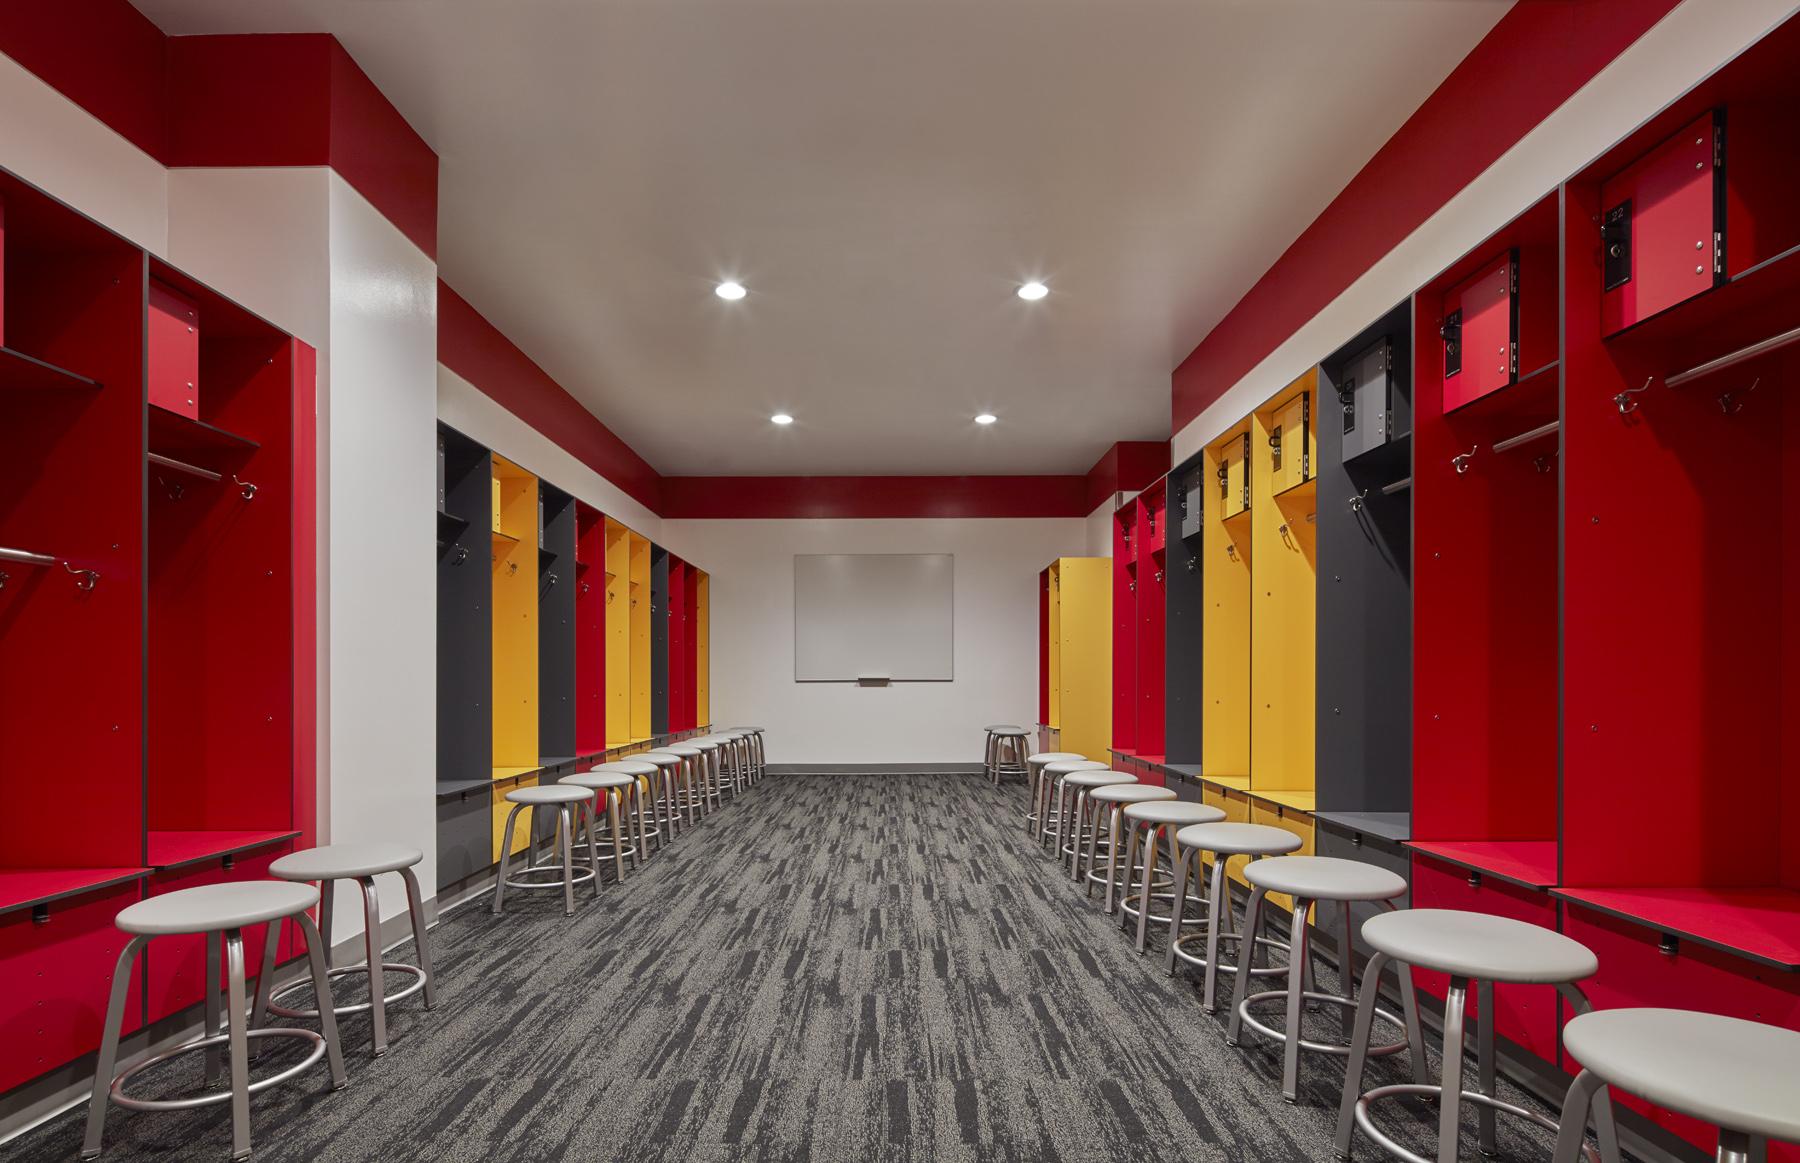 Typical team/locker room